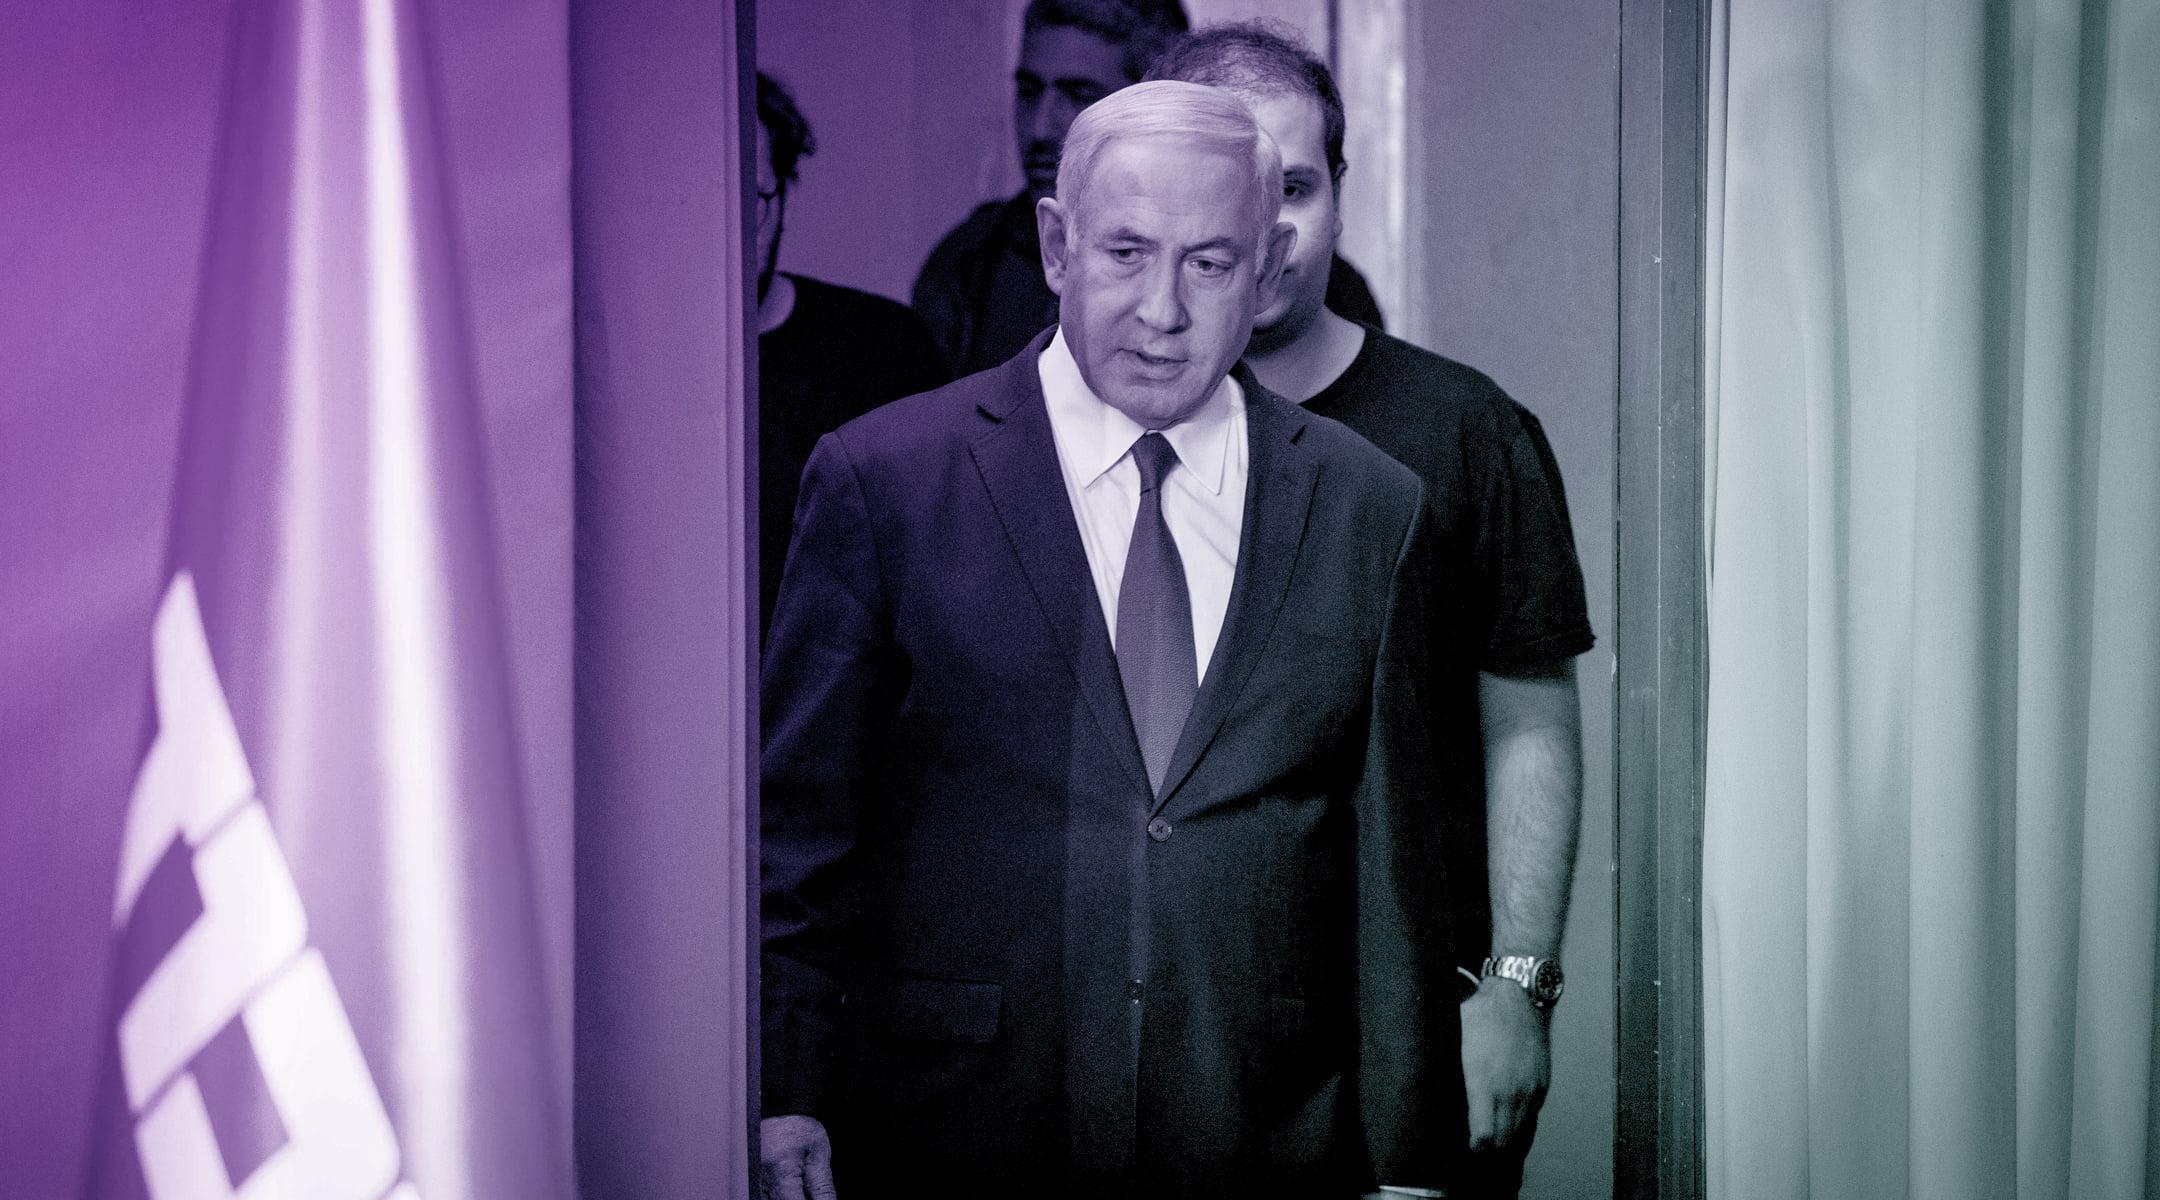 Les chefs d'accusation contre Benjamin Netanyahu premier ministre d'Israël